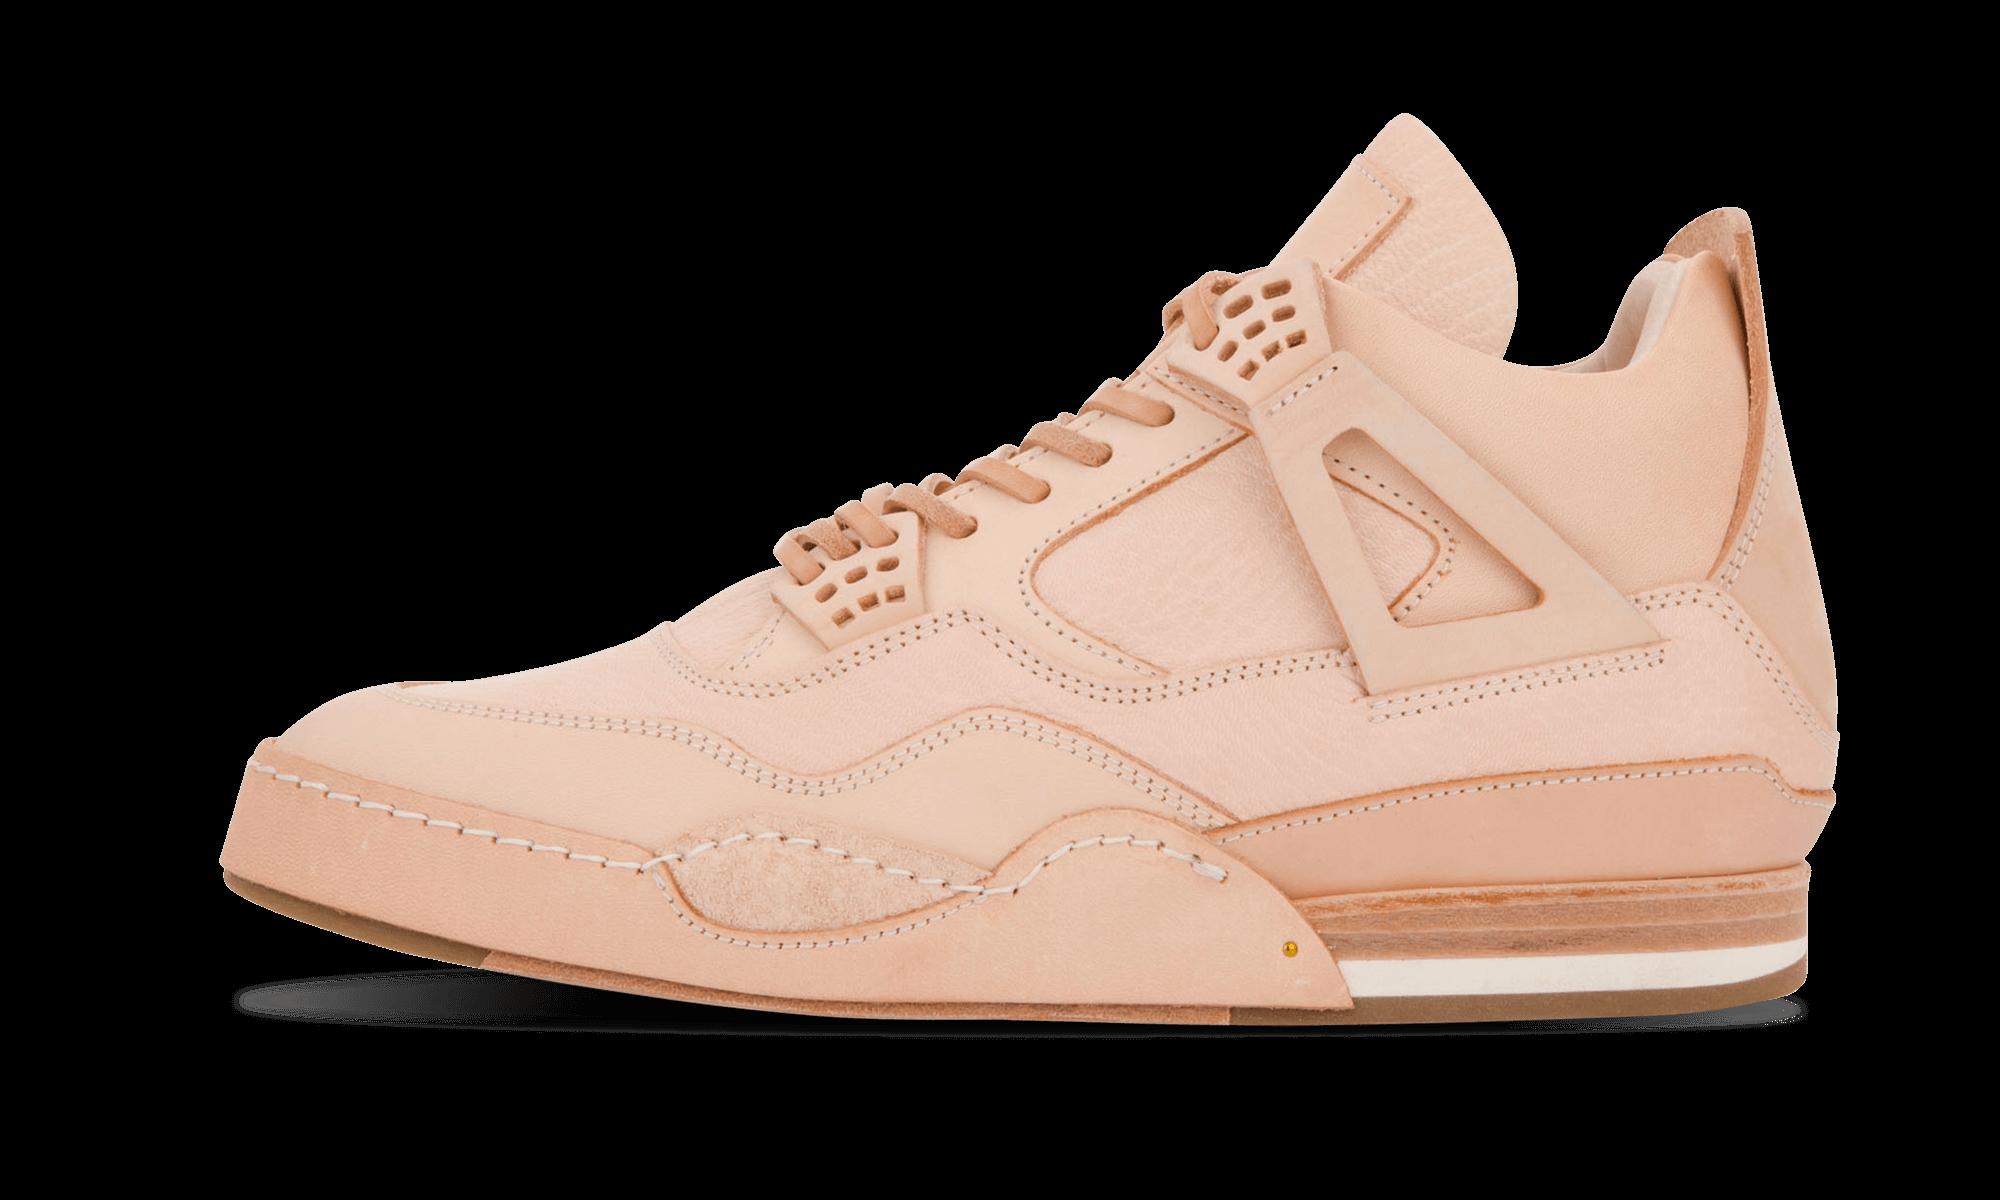 Air jordans, Jordan 4, Leather